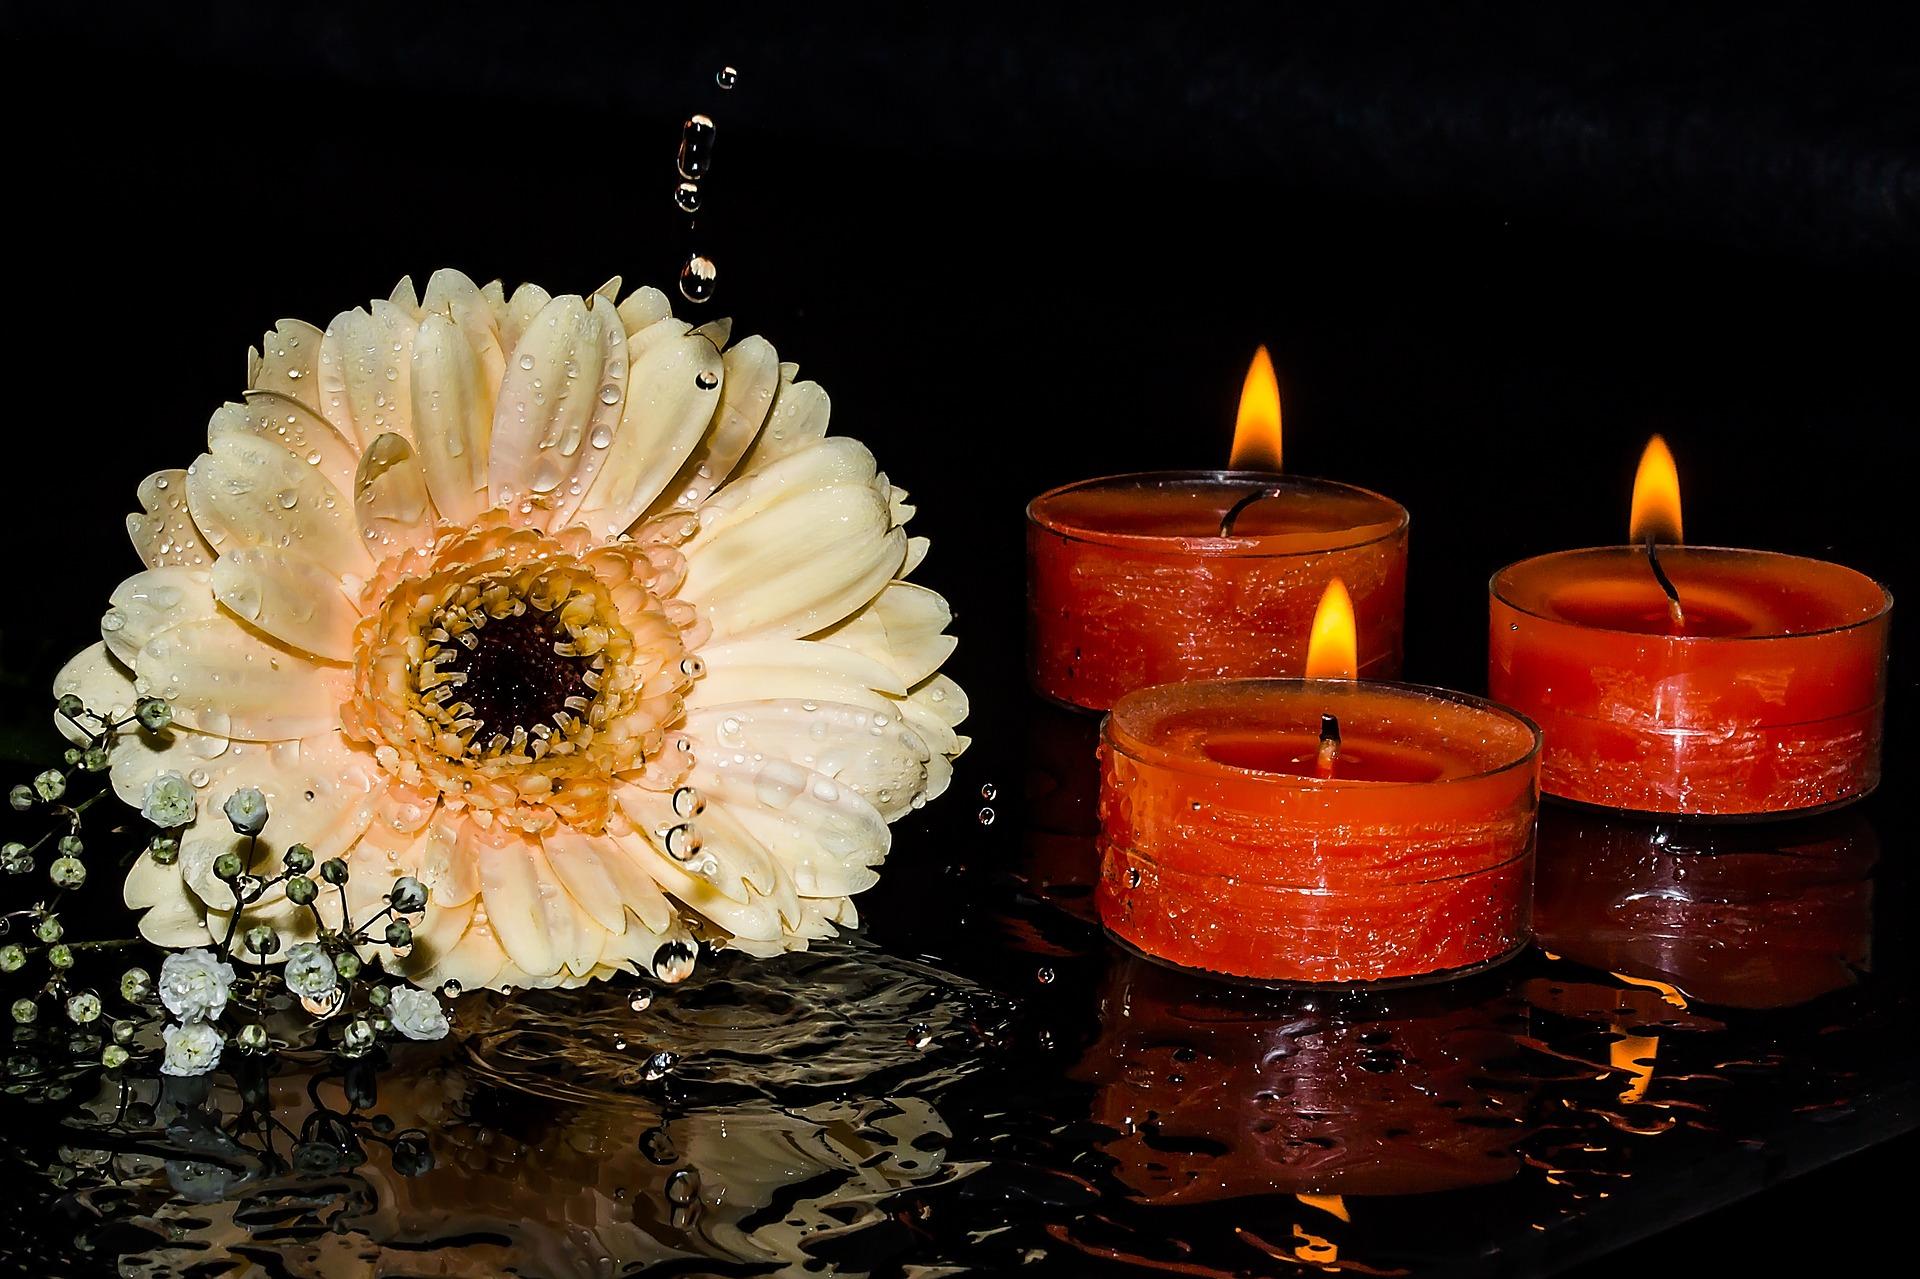 Kerzen auf dem Grab